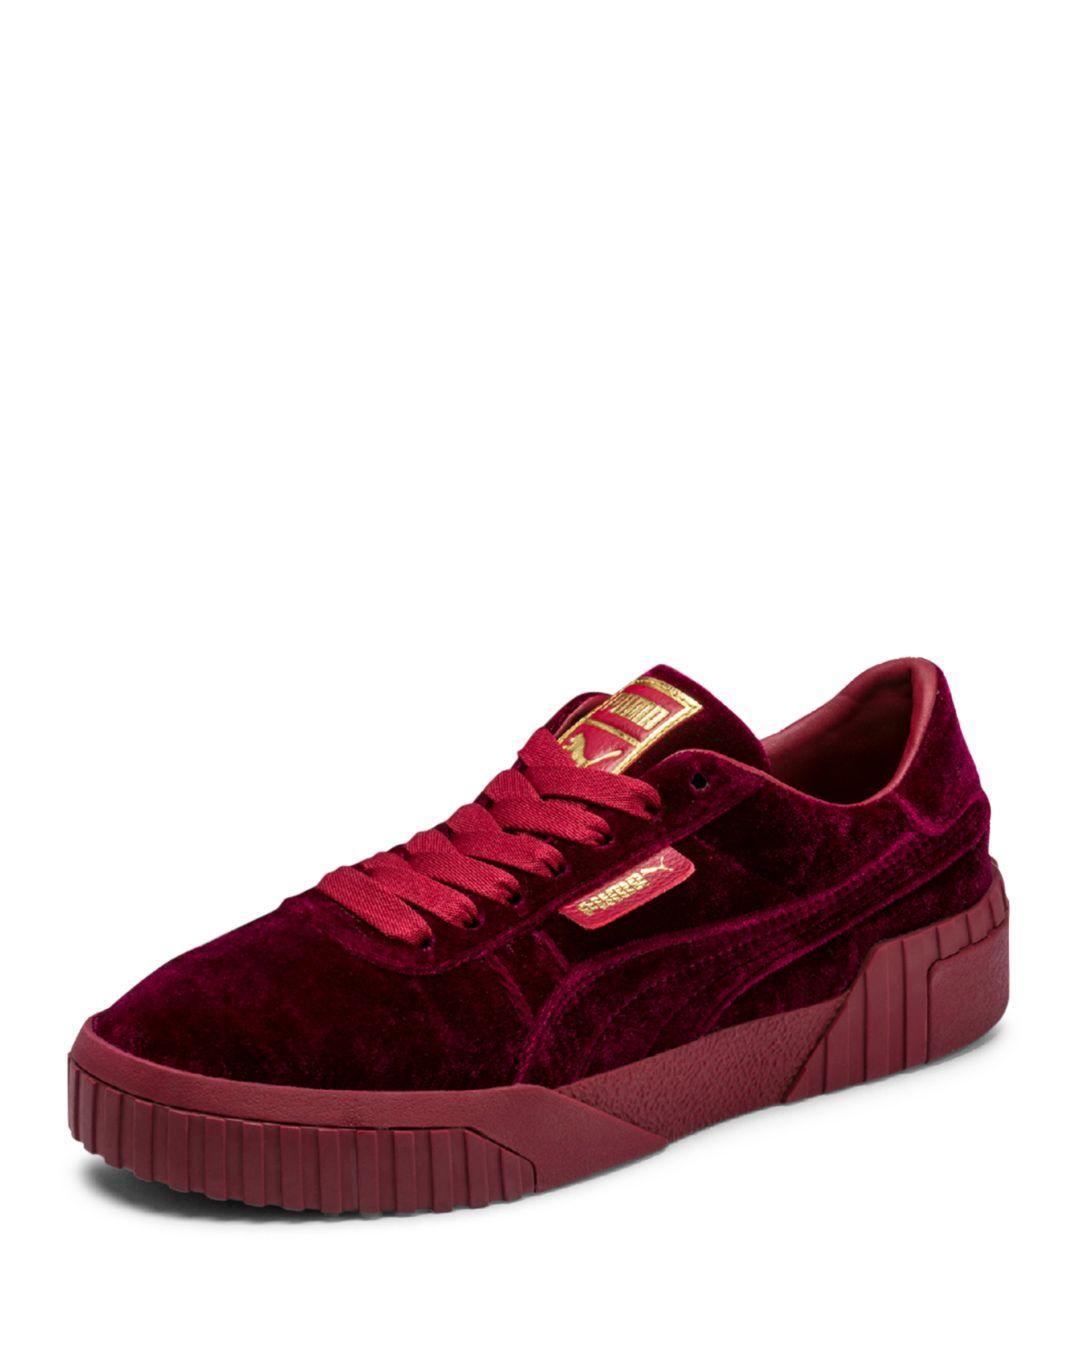 PUMA Cali Velvet (red) Classic Shoes